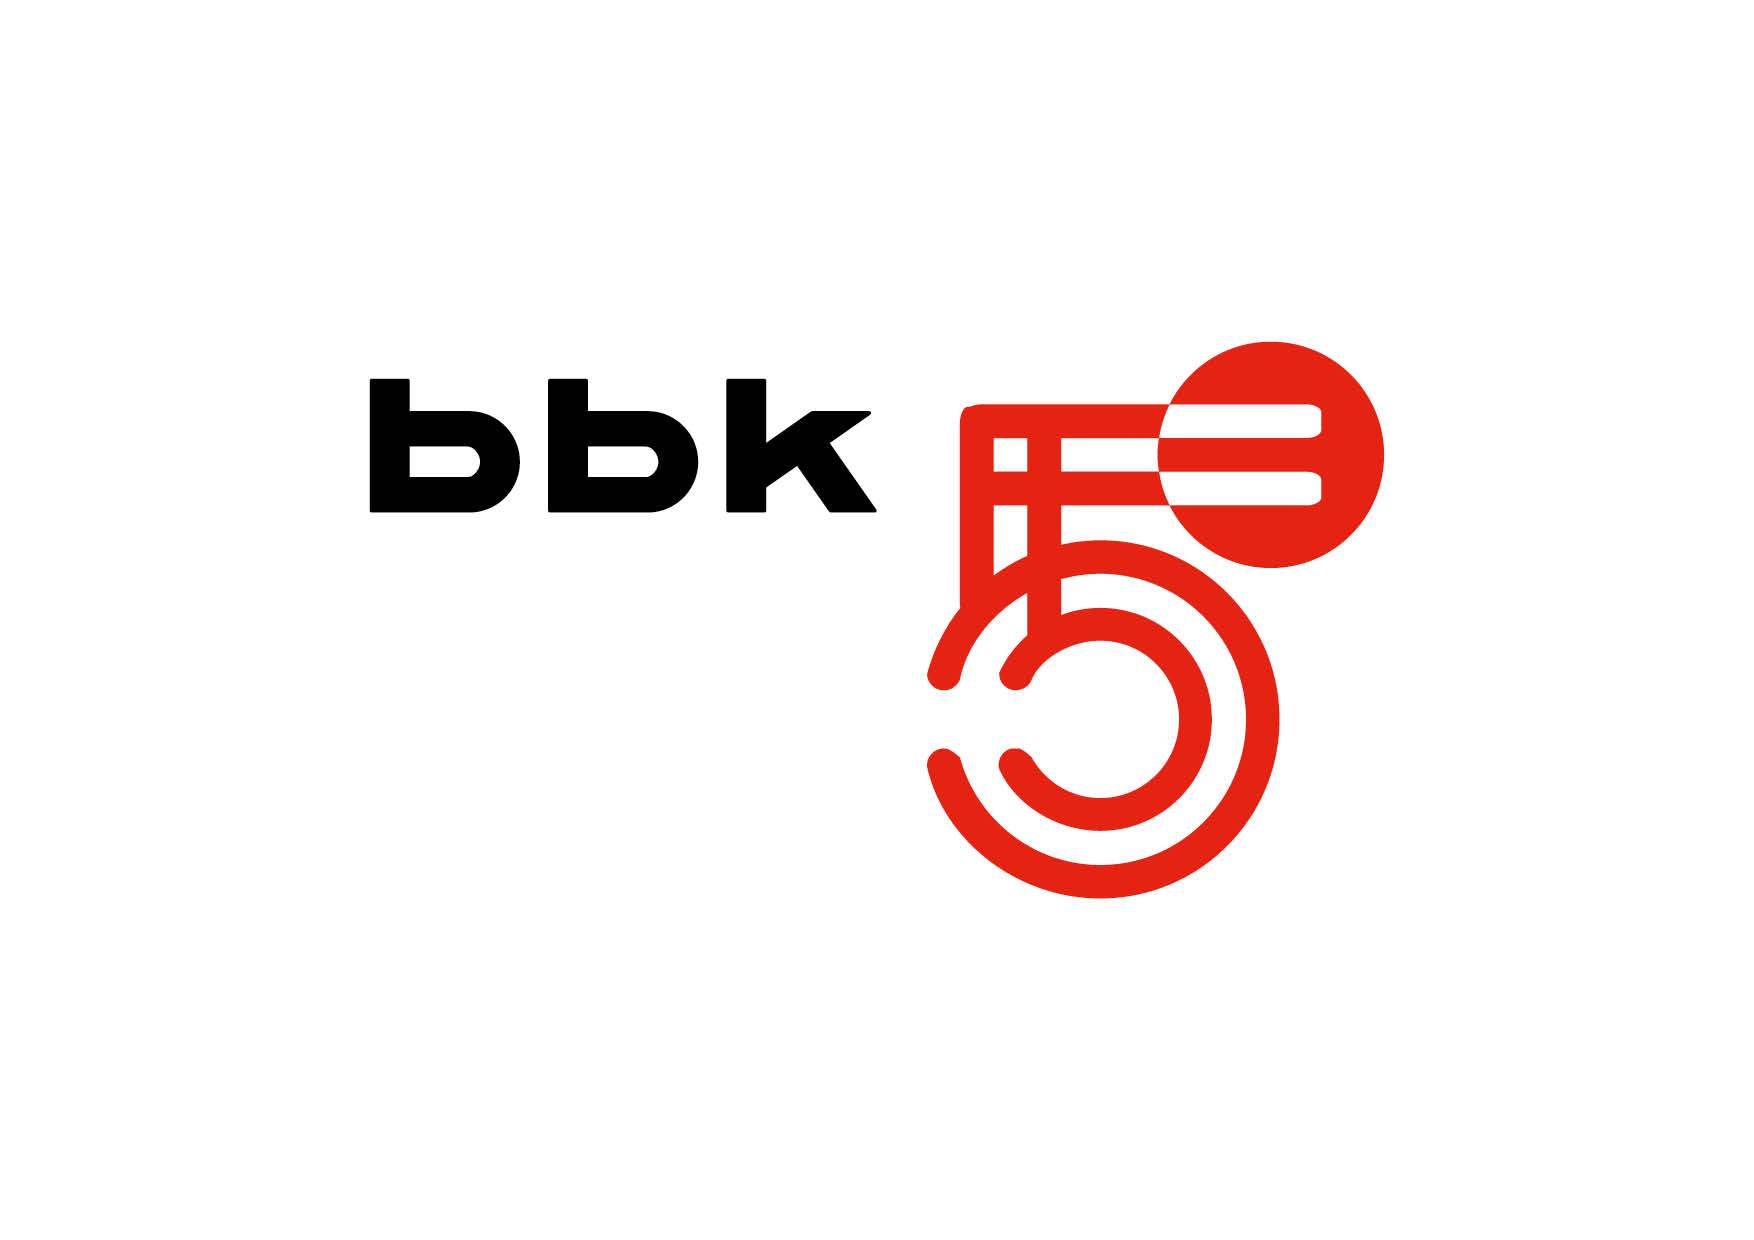 BBk 5 aniversario Obra social